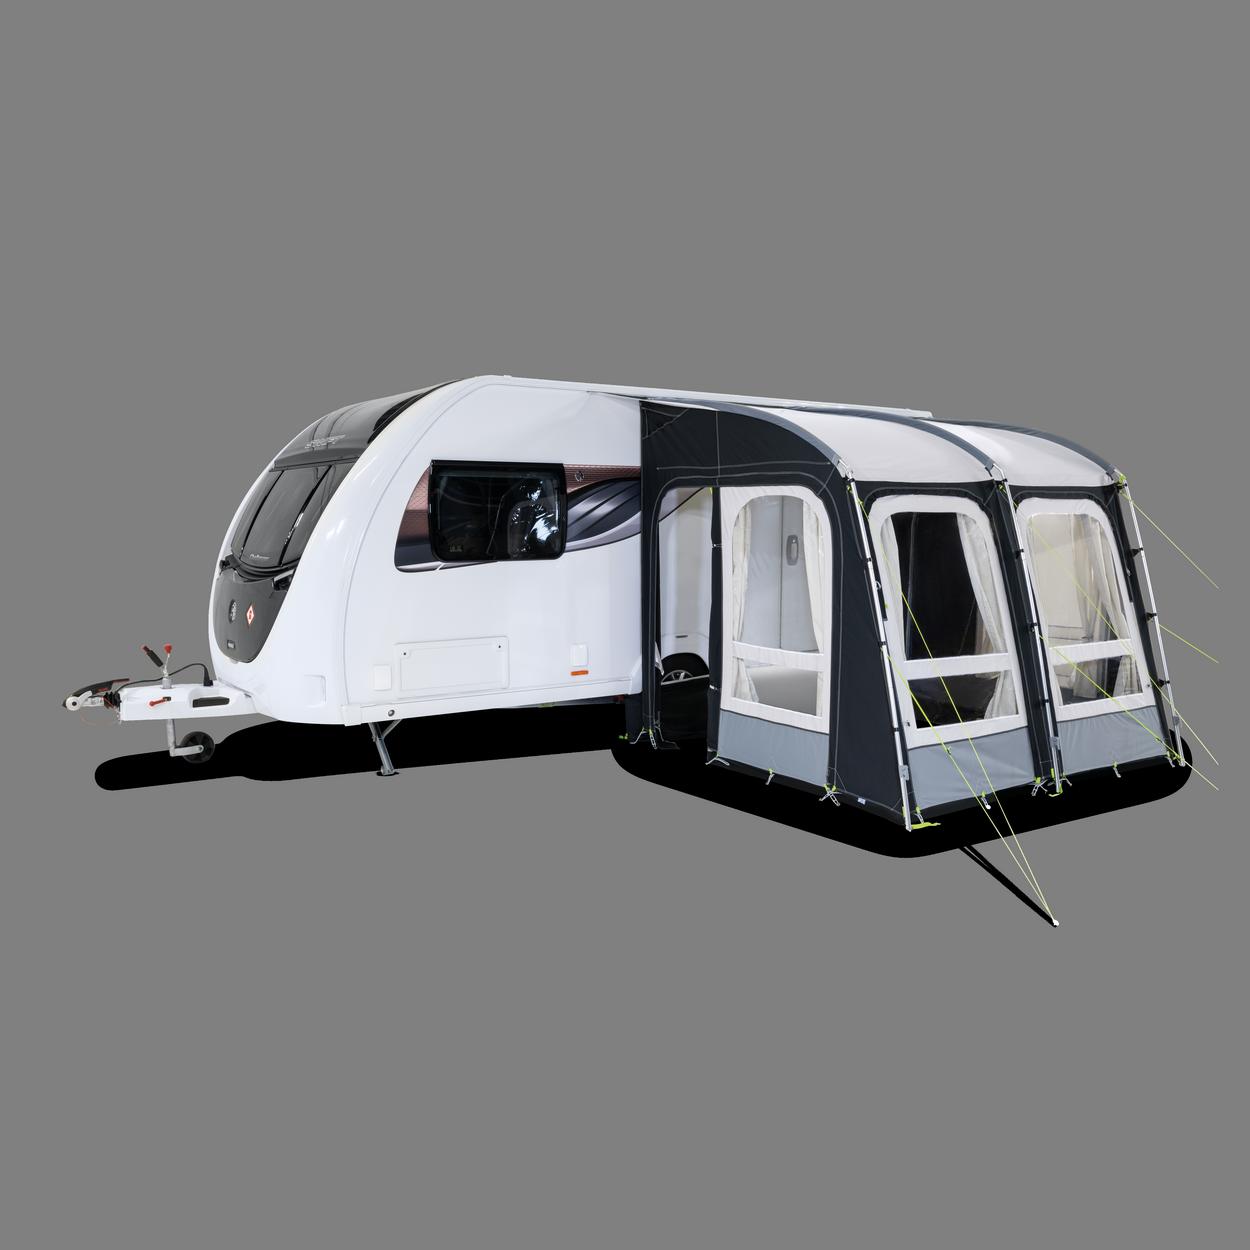 Kampa Dometic Rally Pro 260 Norwich Camping Aw0006